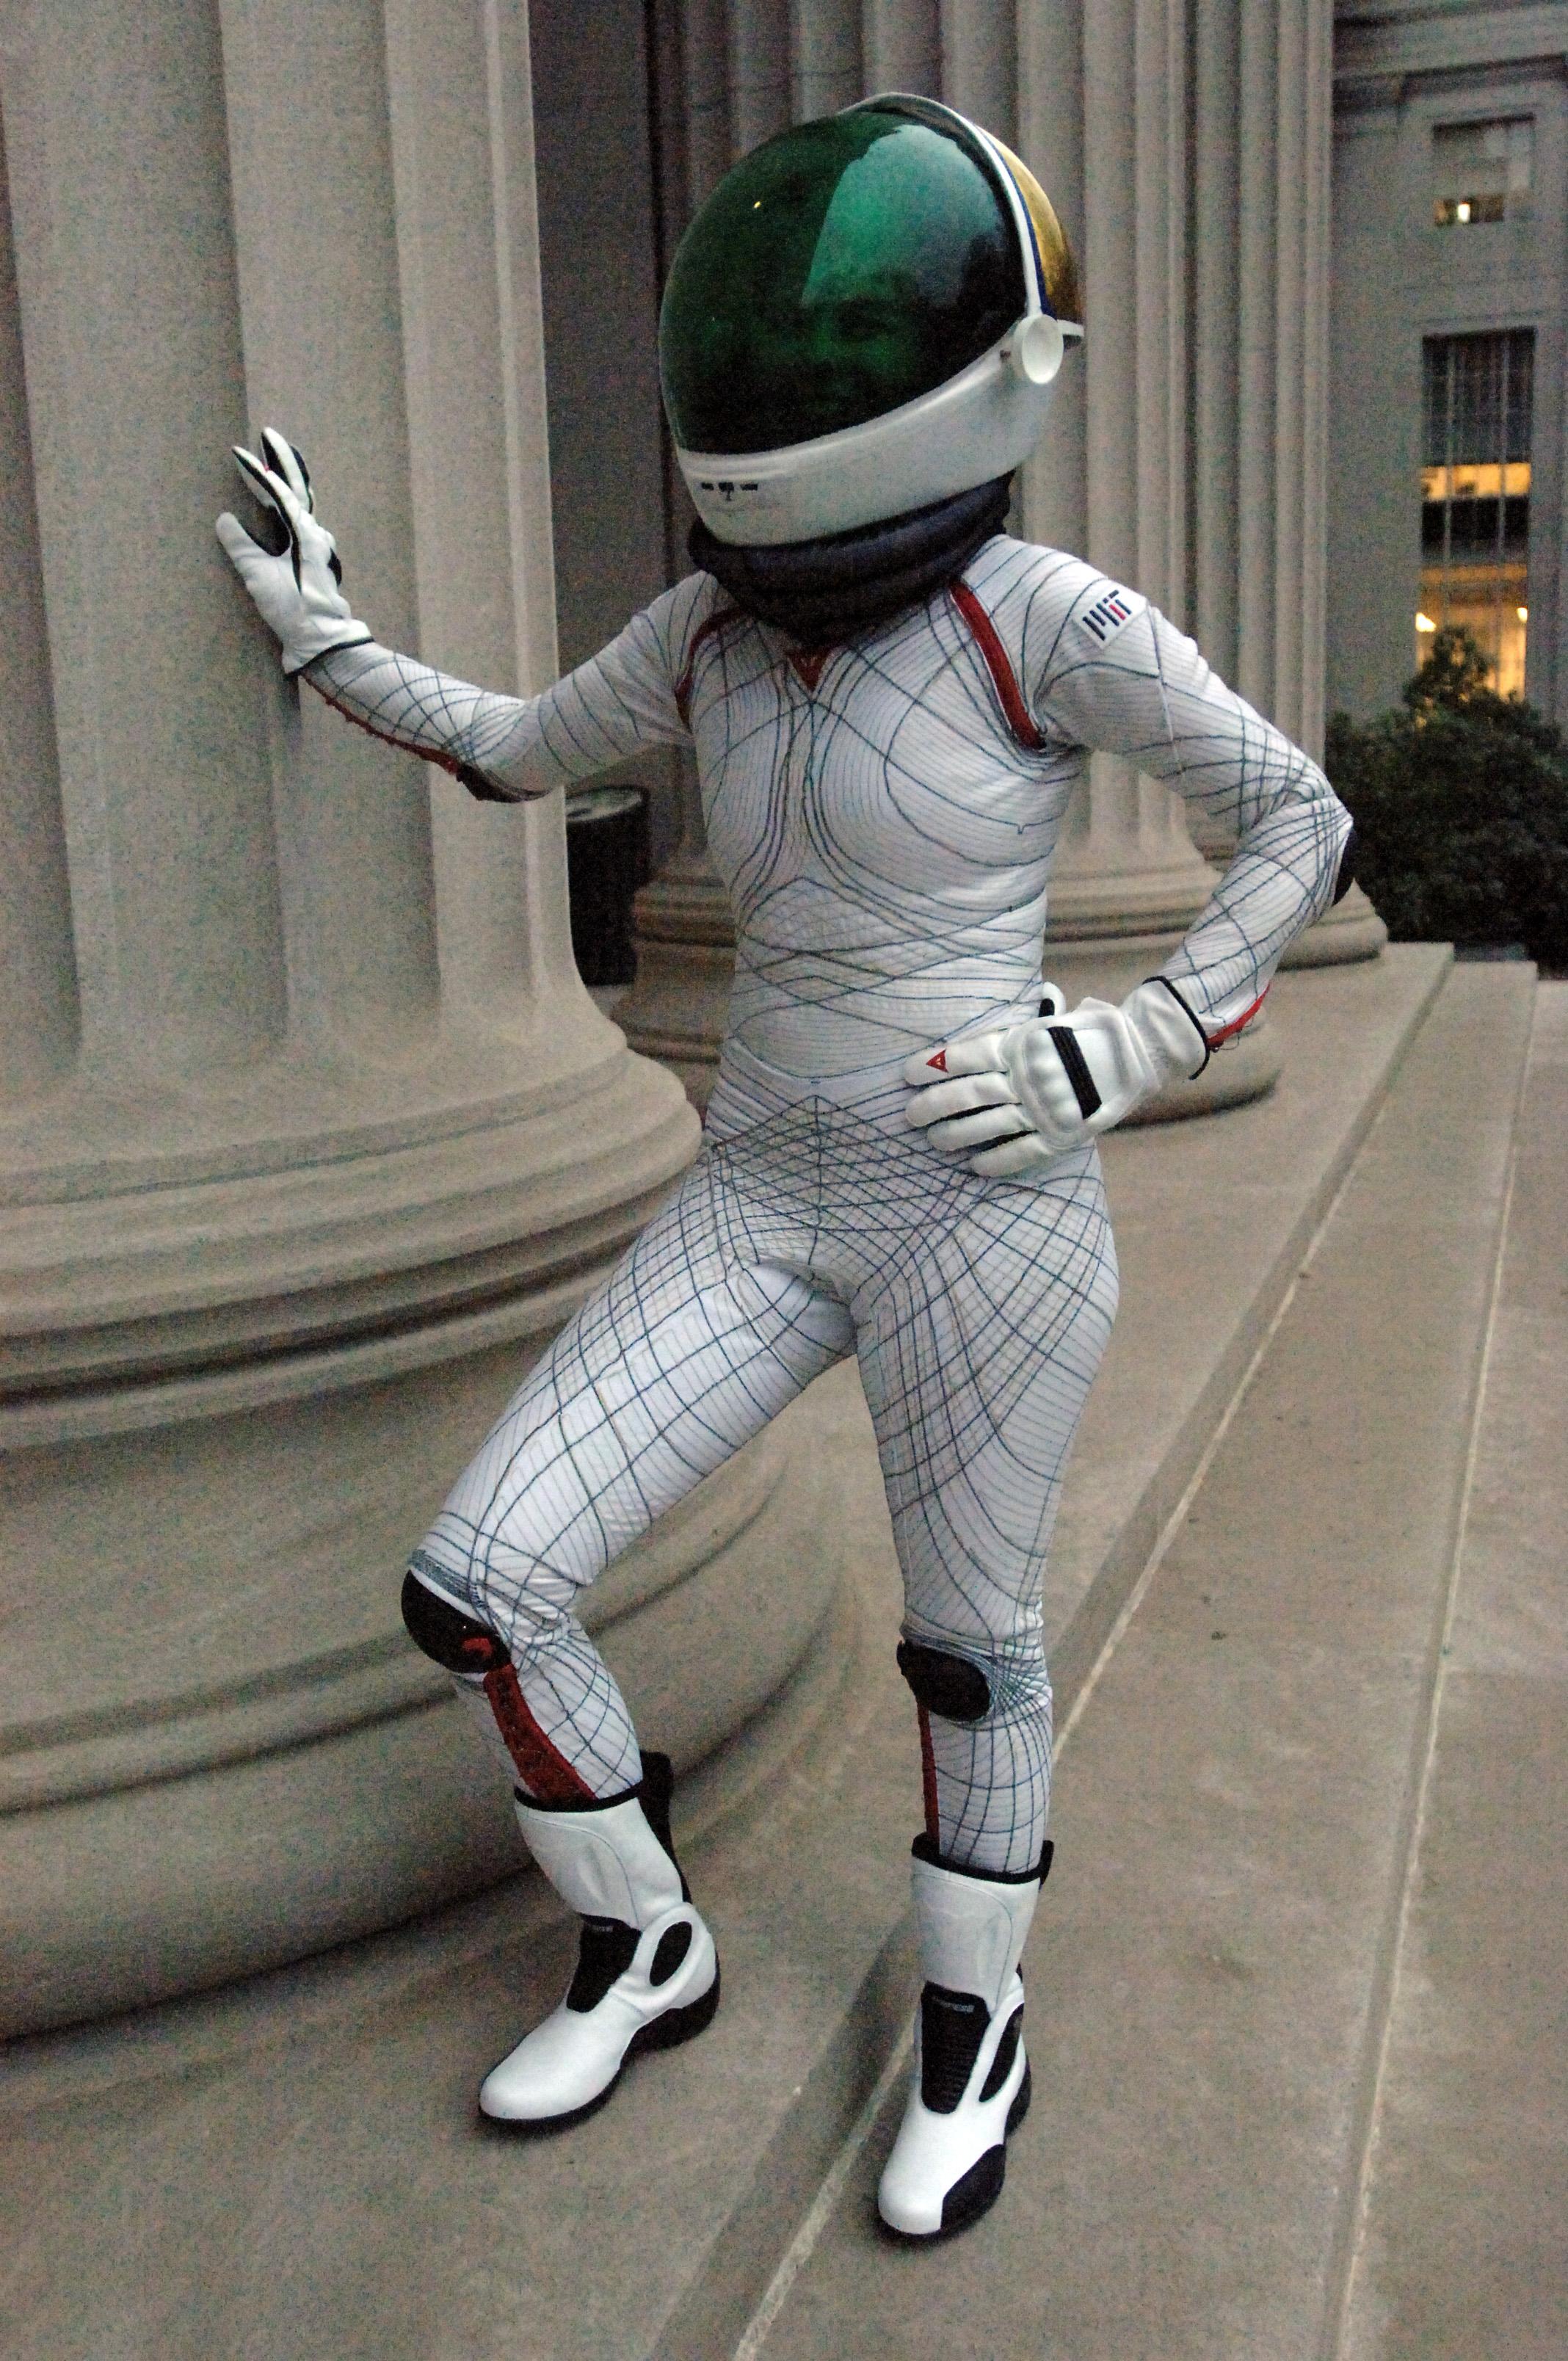 future space suits designs - photo #33